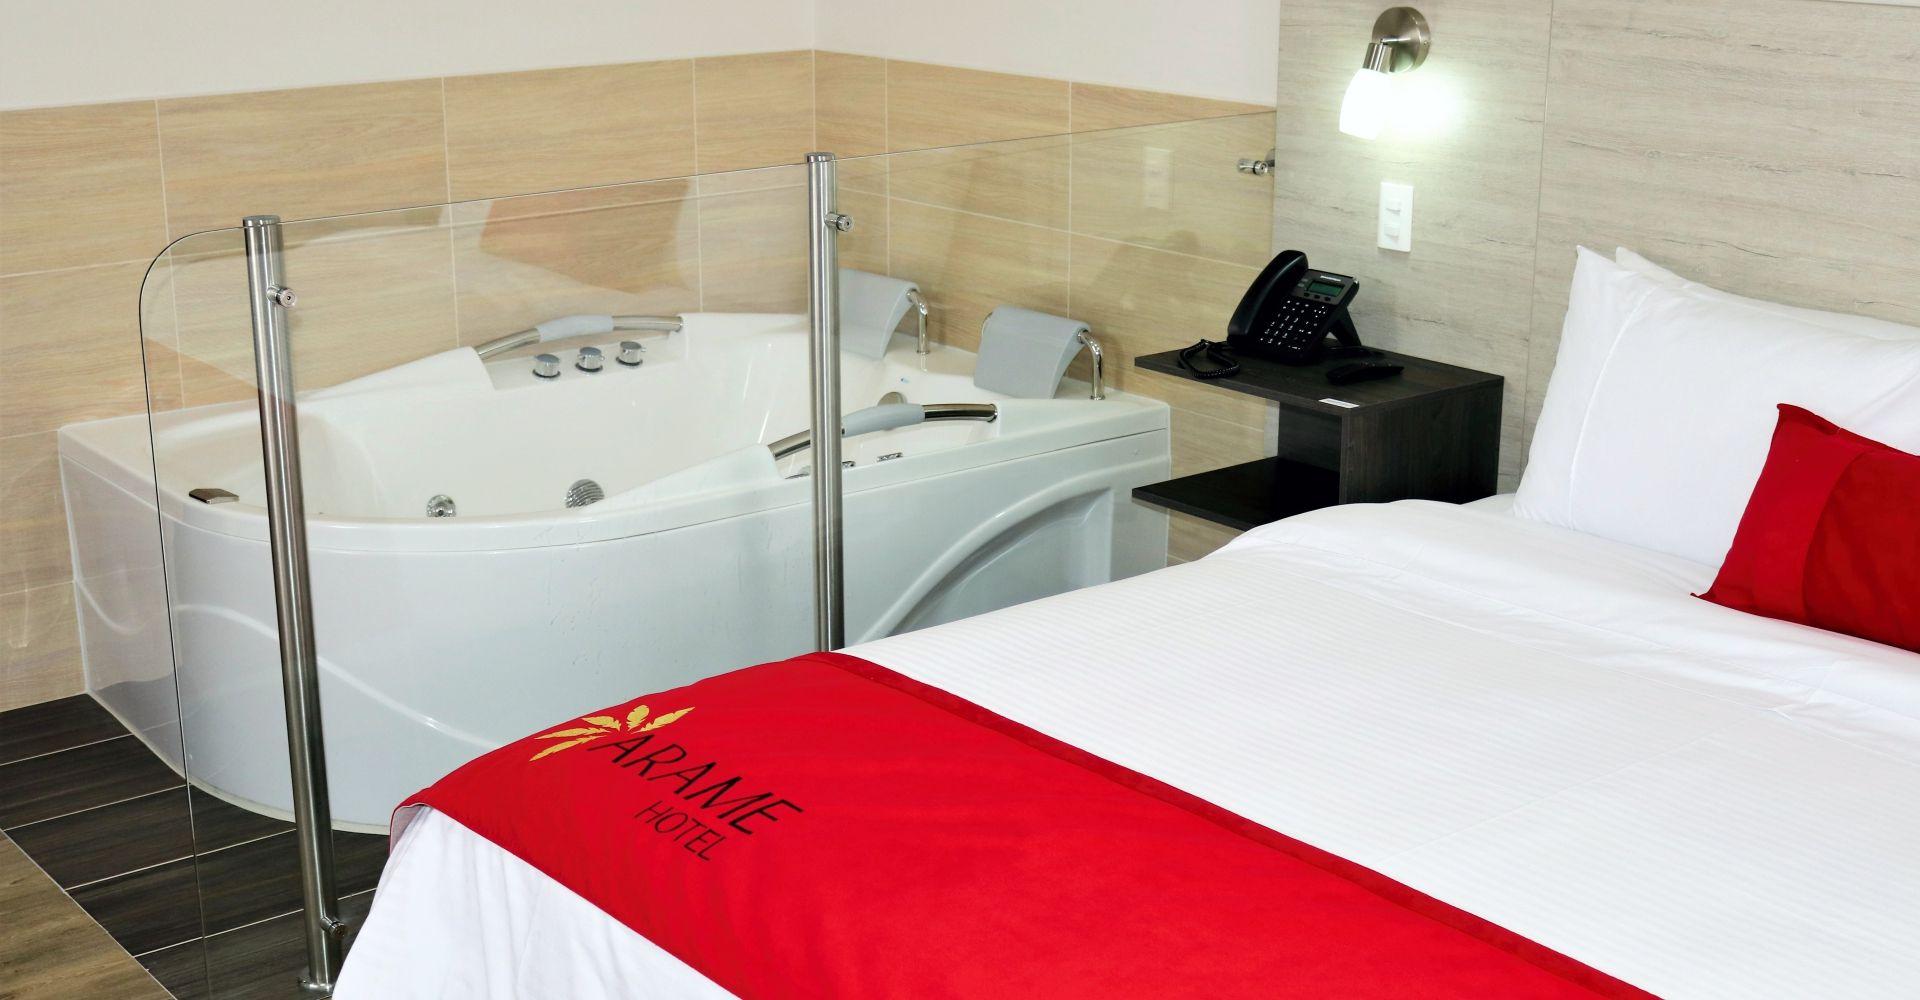 IM-1-Habiraciones-Hotel-Arame-compressor